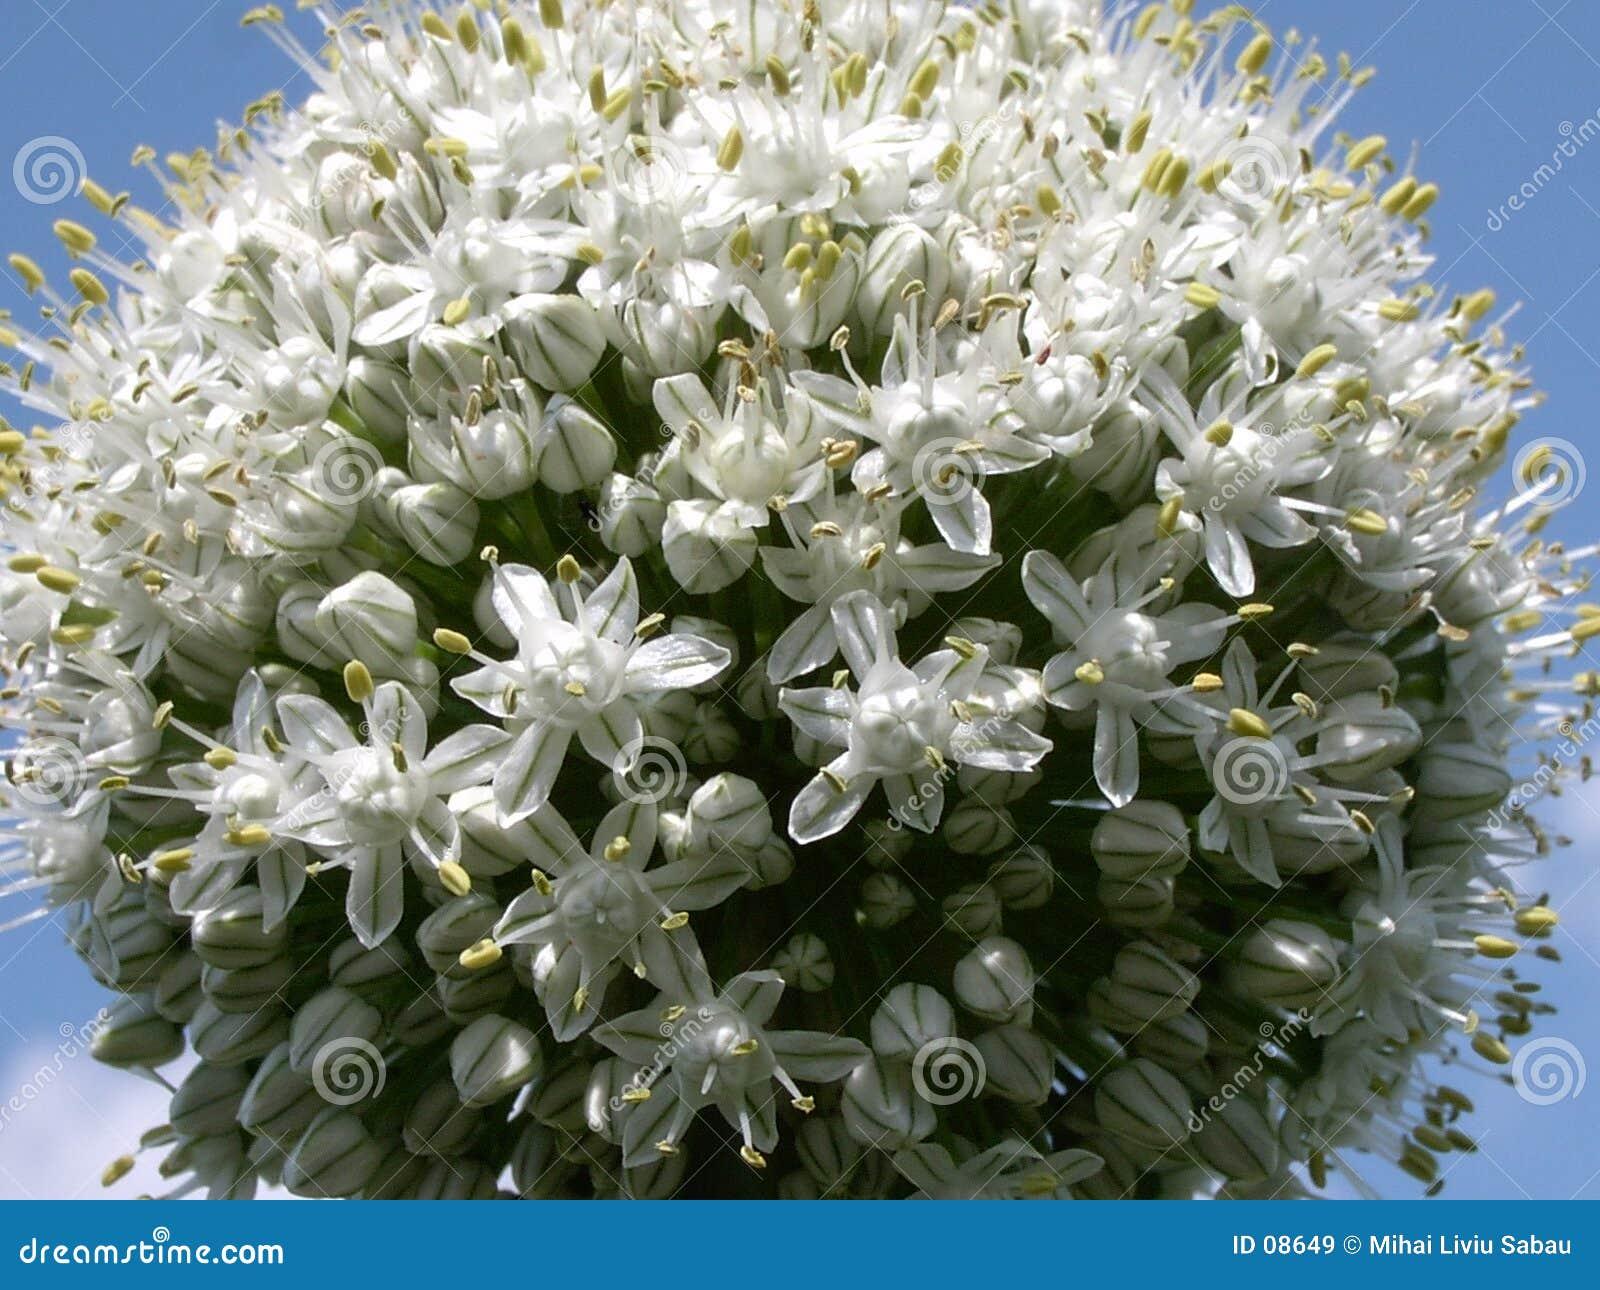 Onion Flower 2